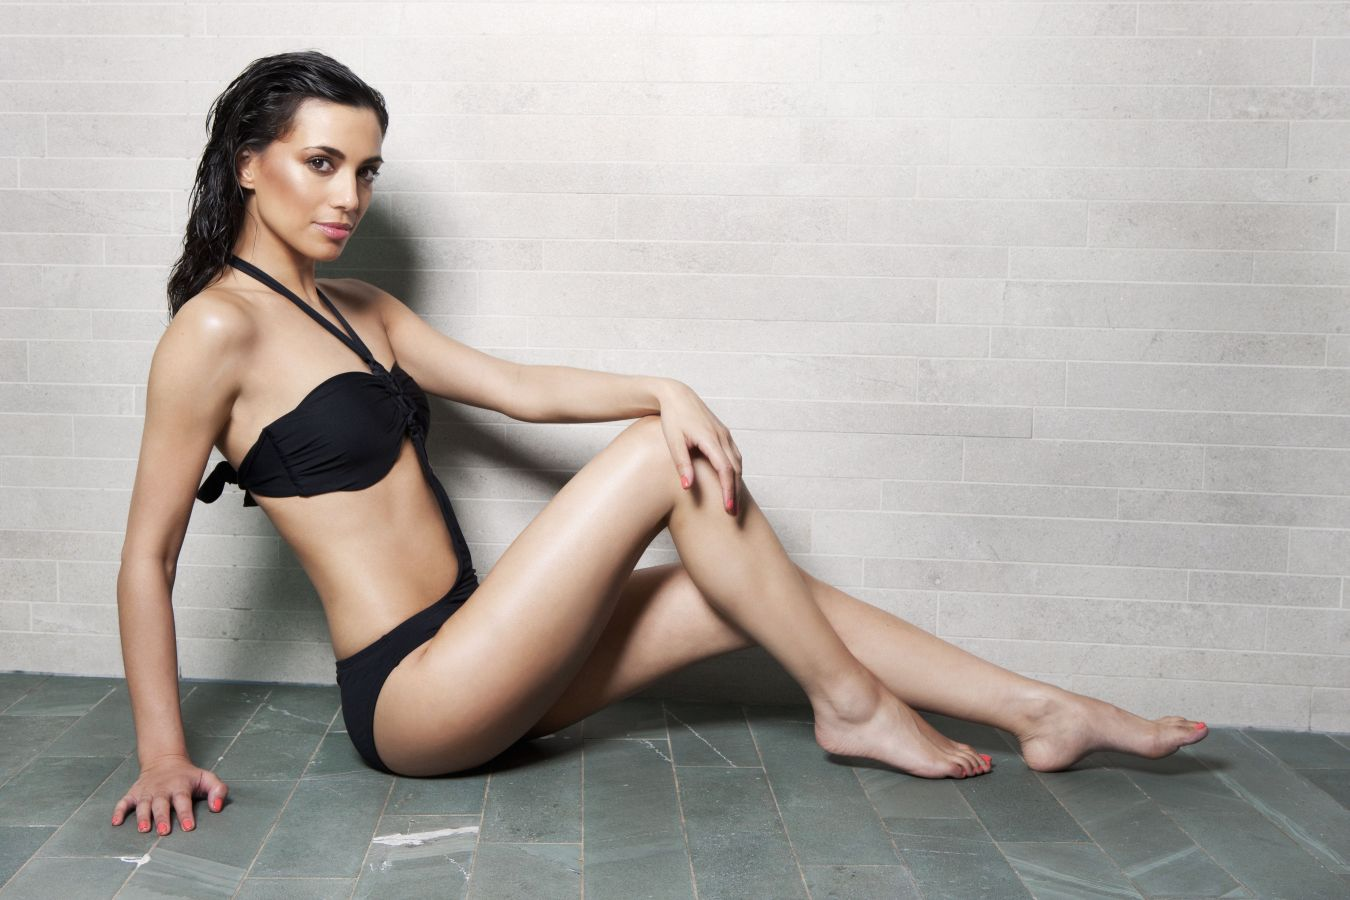 Angelina chung has her feet worshipped 9